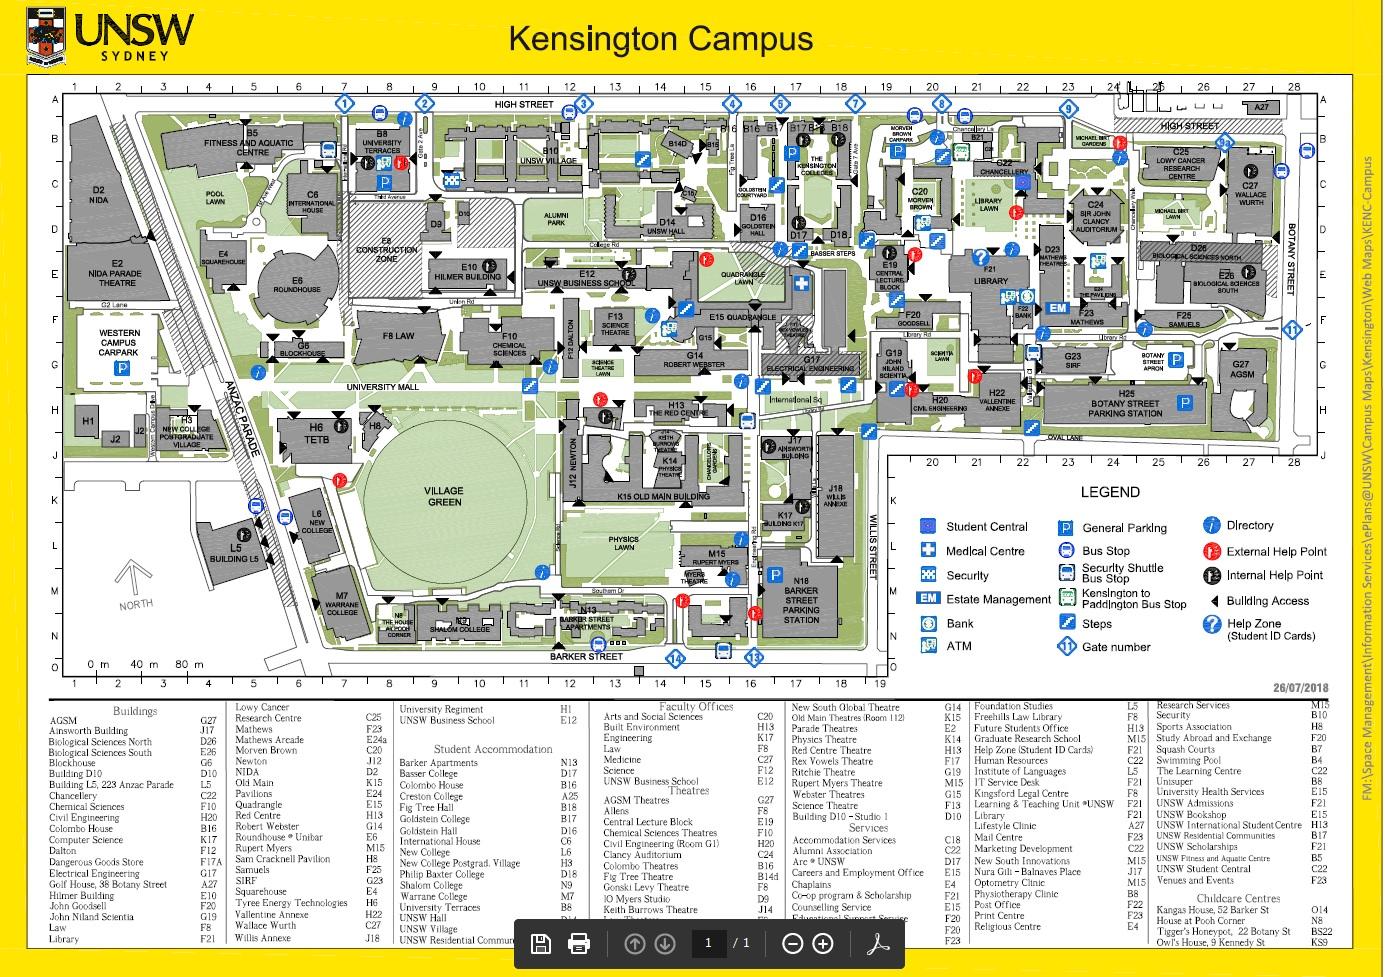 UNSW Kensington Campus Map